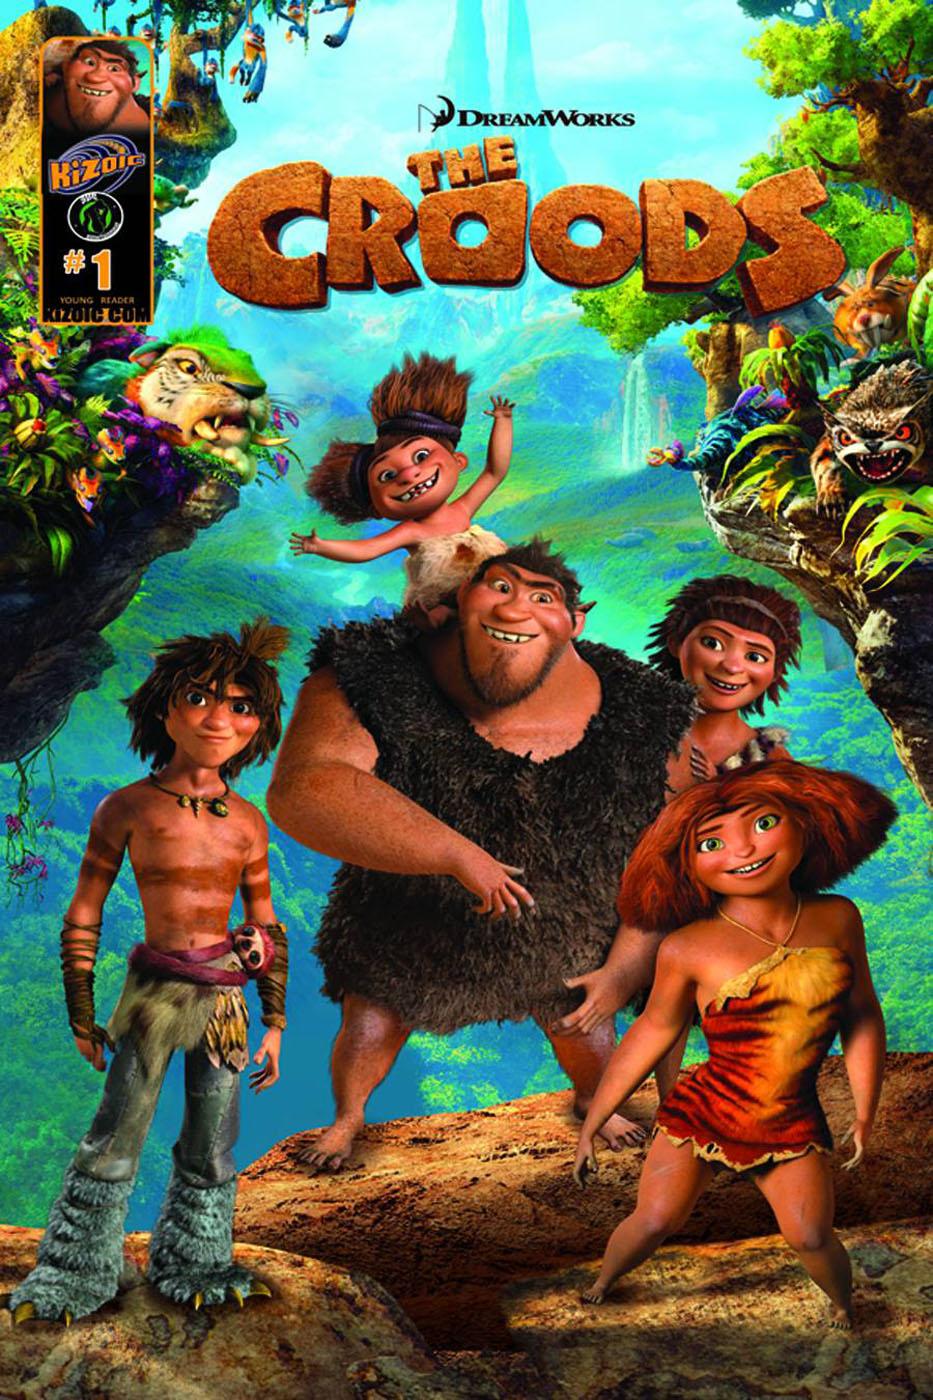 The Croods - Movie Poster #9 (Original)